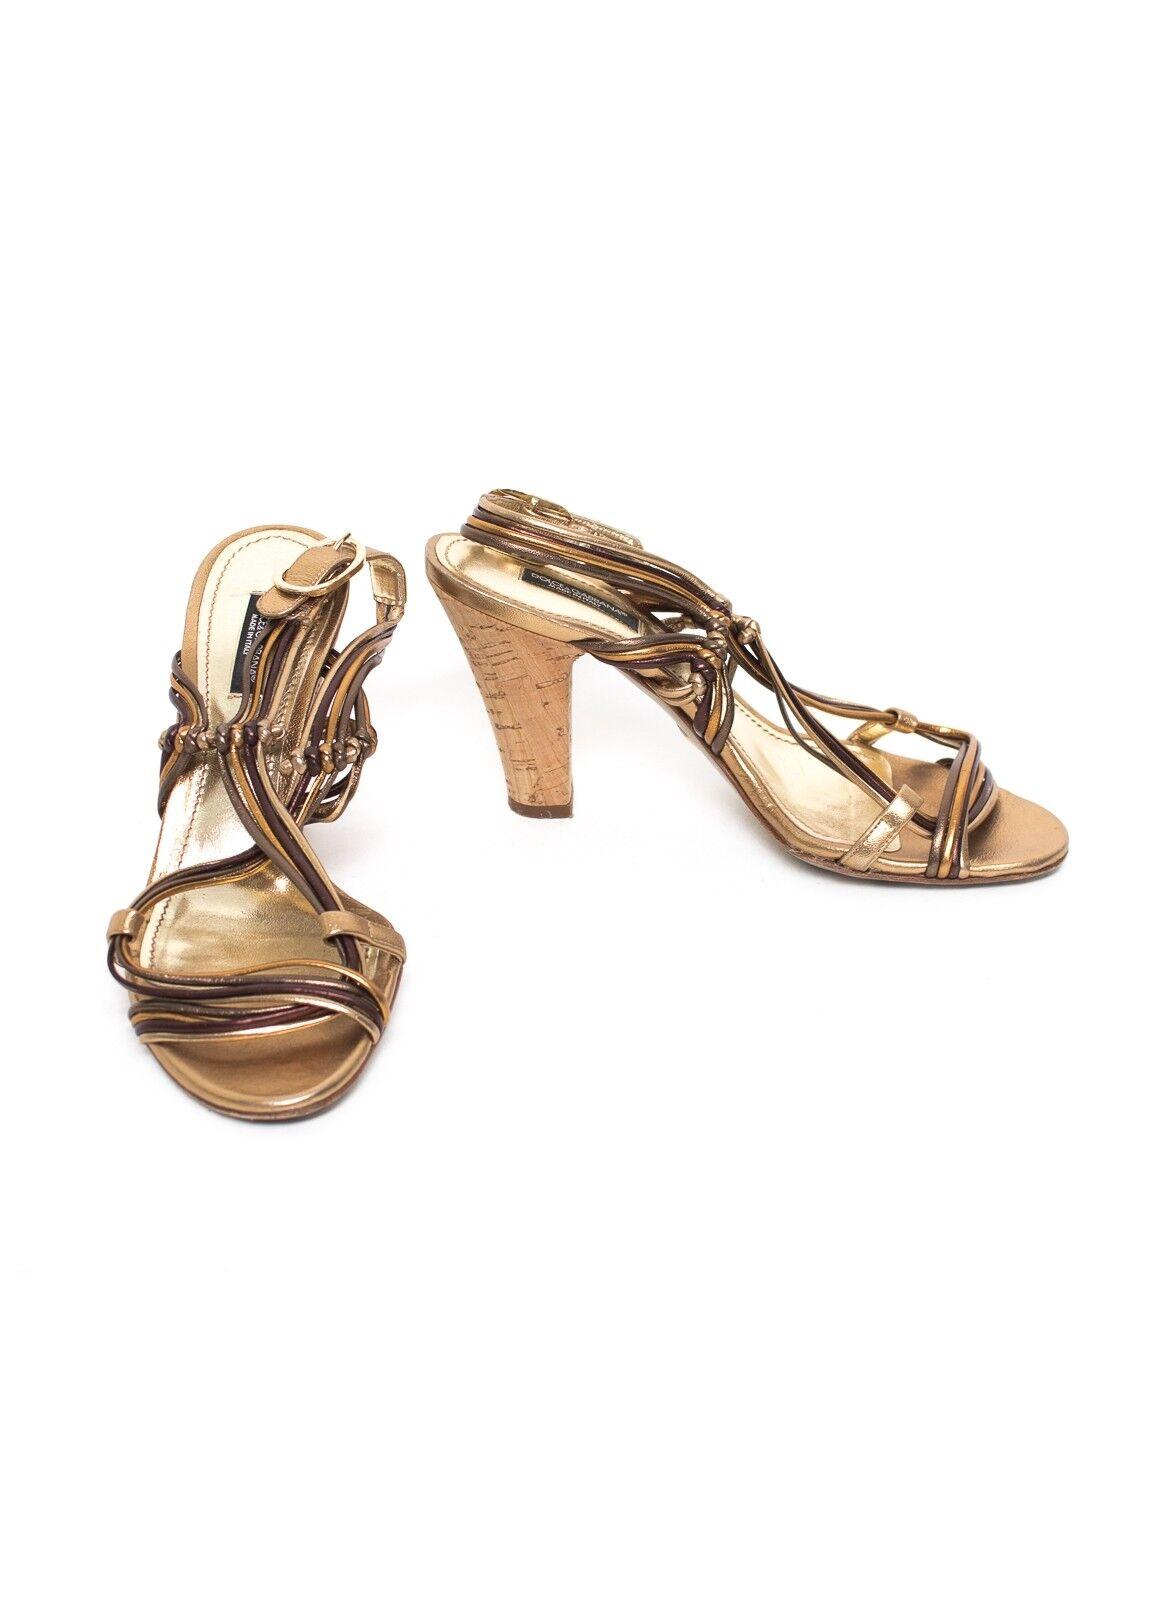 Descuento barato DOLCE & GABBANA Sandalen Gr. EU 36,5 Damen Schuhe Pumps High Heels Leder